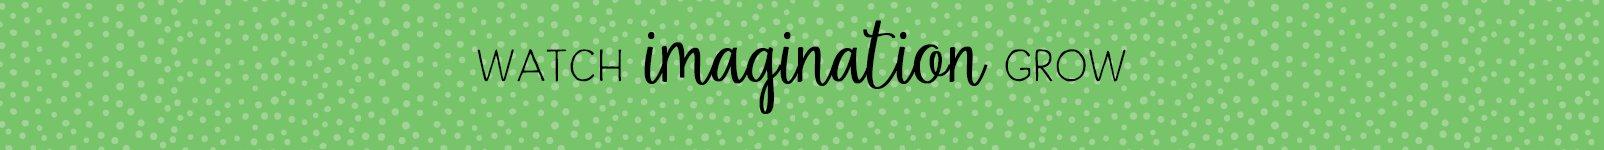 Watch imagination grow